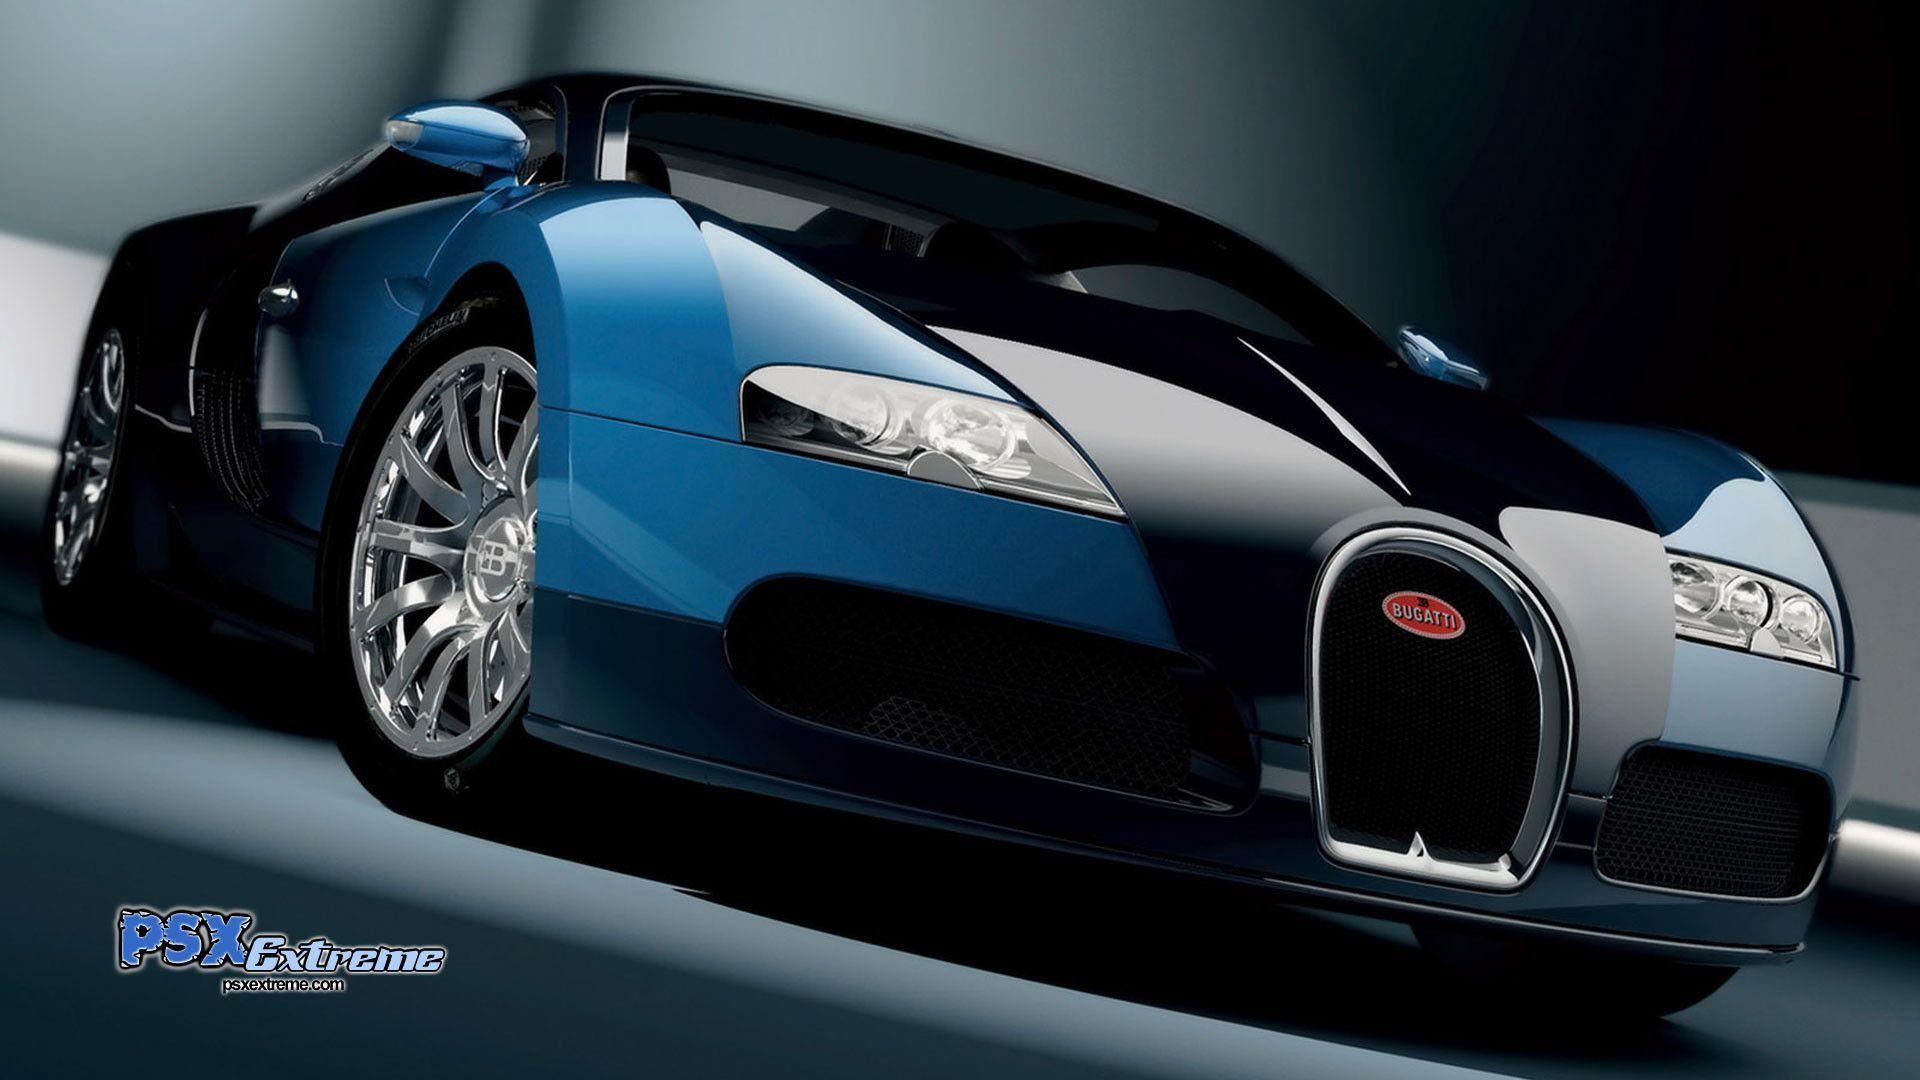 Bugatti Veyron Super Sports Wallpaper Bugattiveyron Bugatti Veyron Super Sports Wallpaper Car Bugatti Veyron Super Sport Bugatti Veyron Veyron